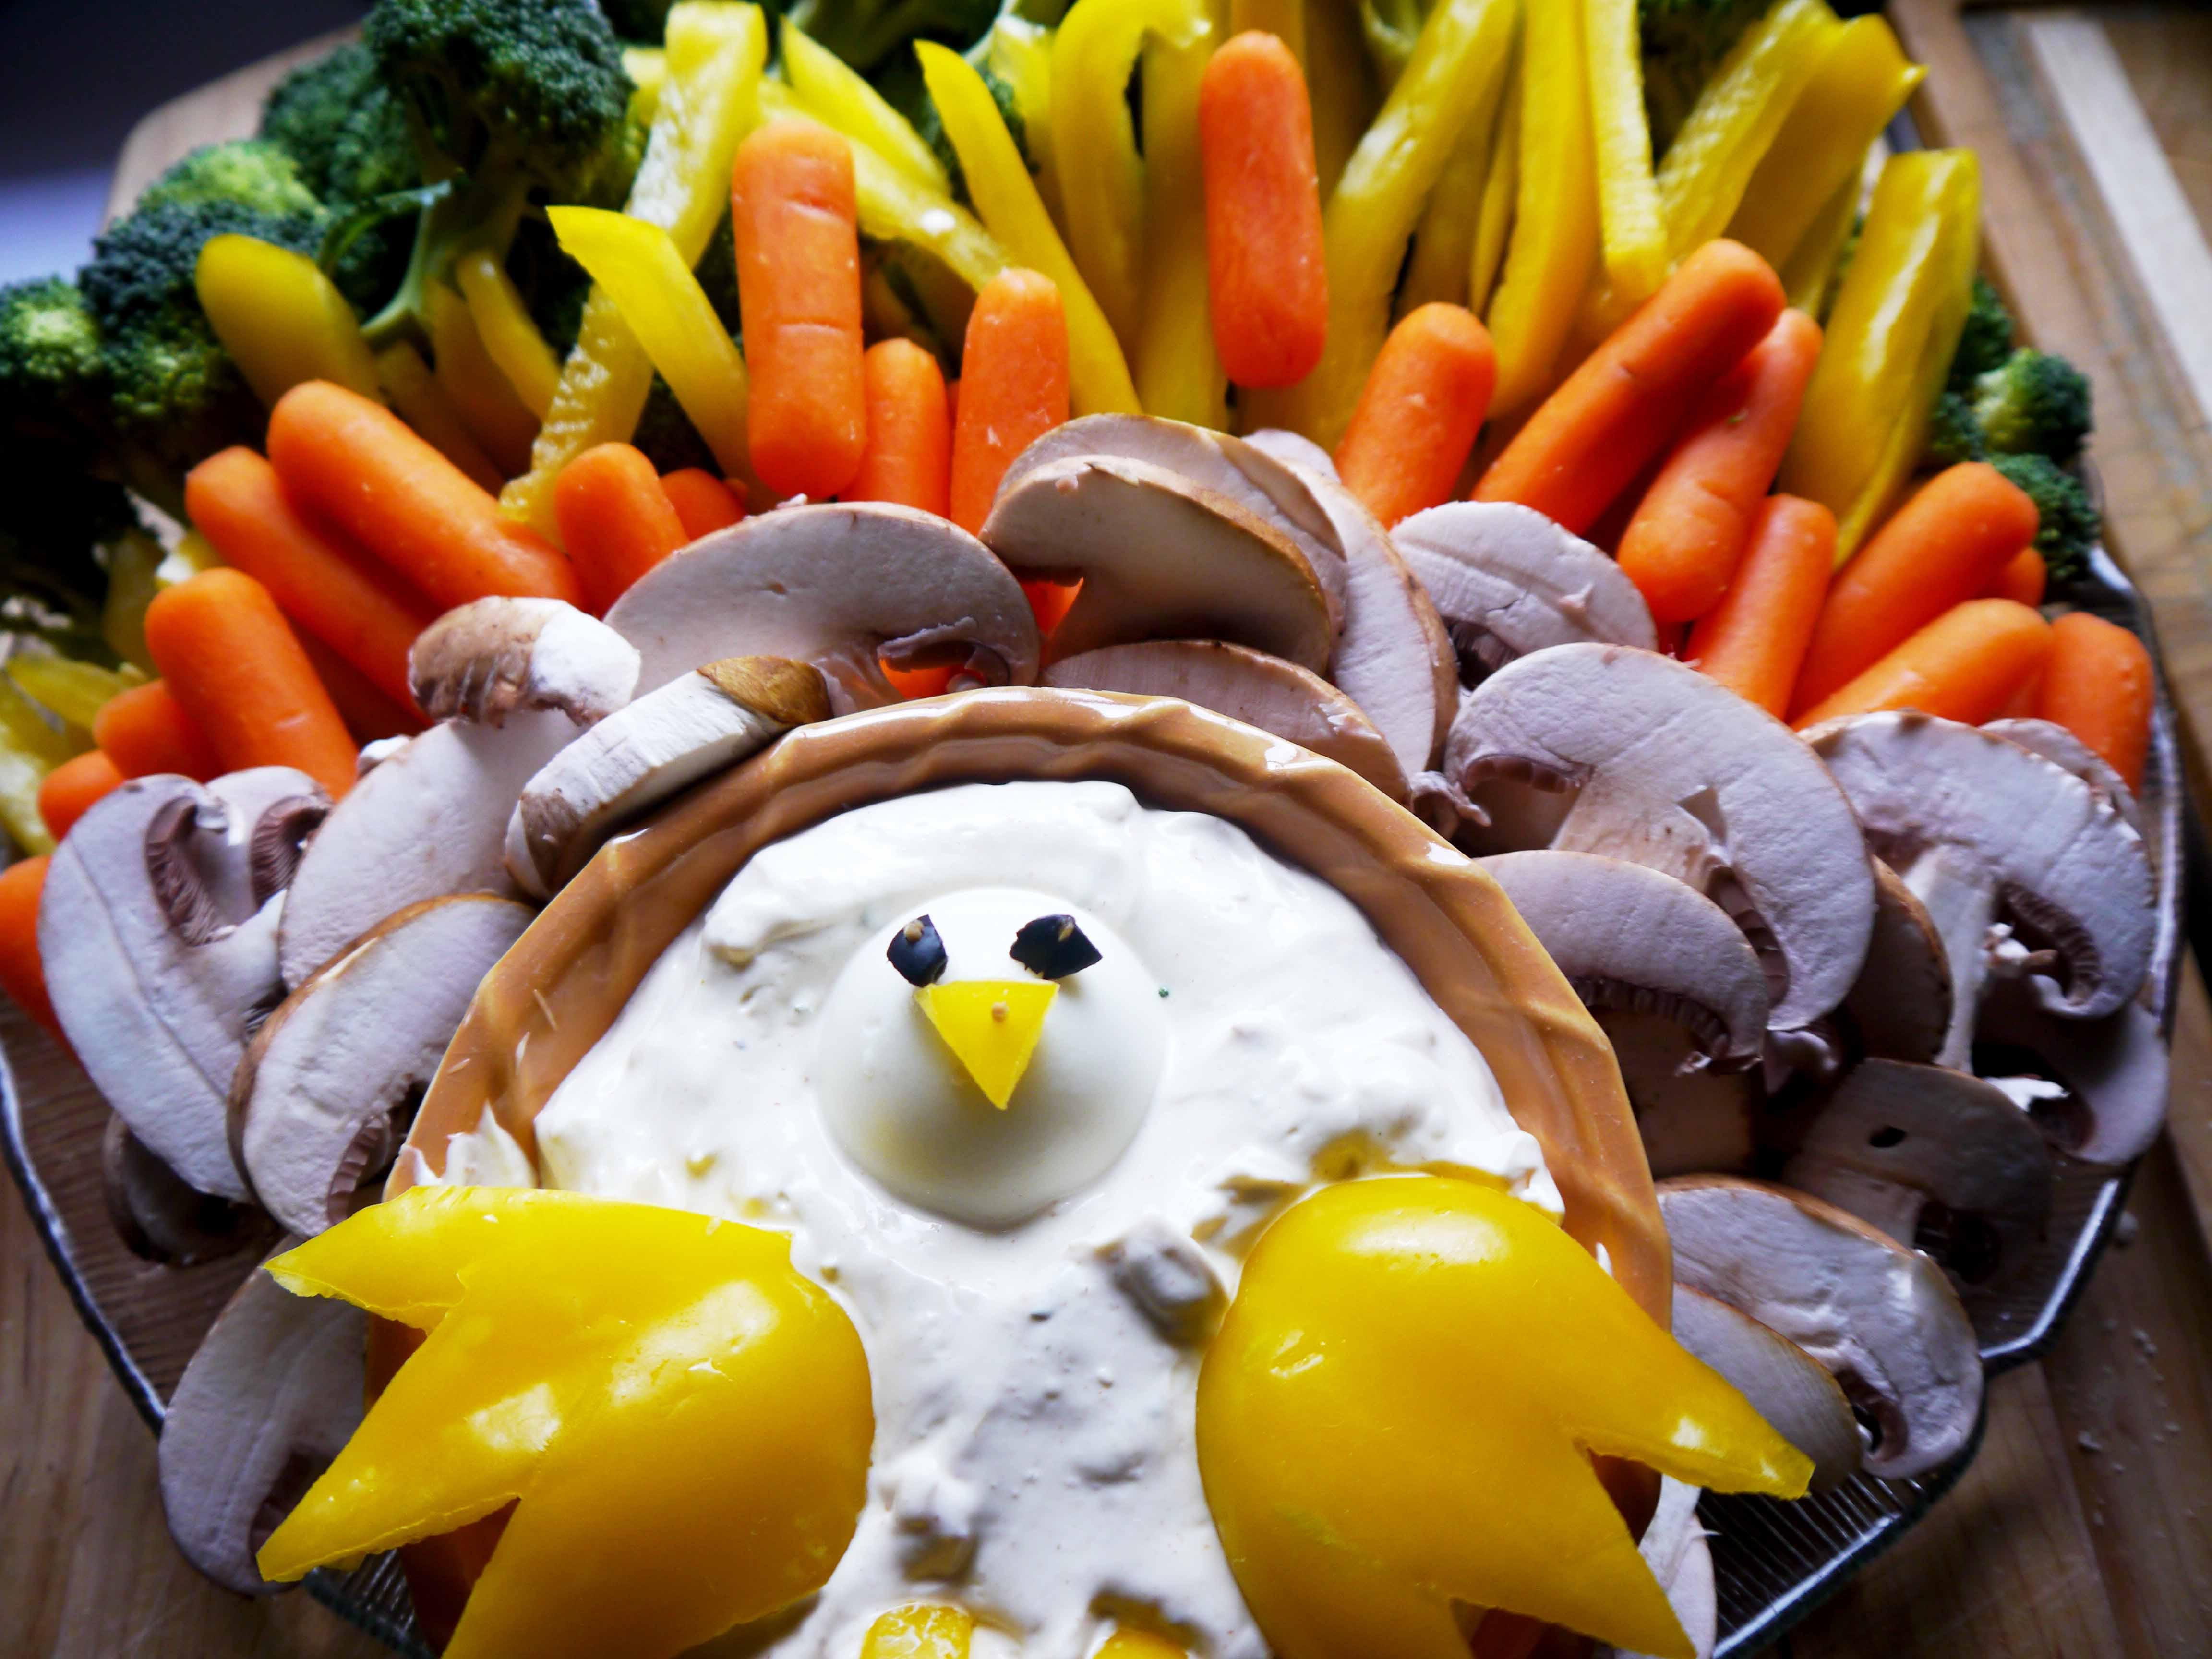 Veggie Turkey Platter and Dip